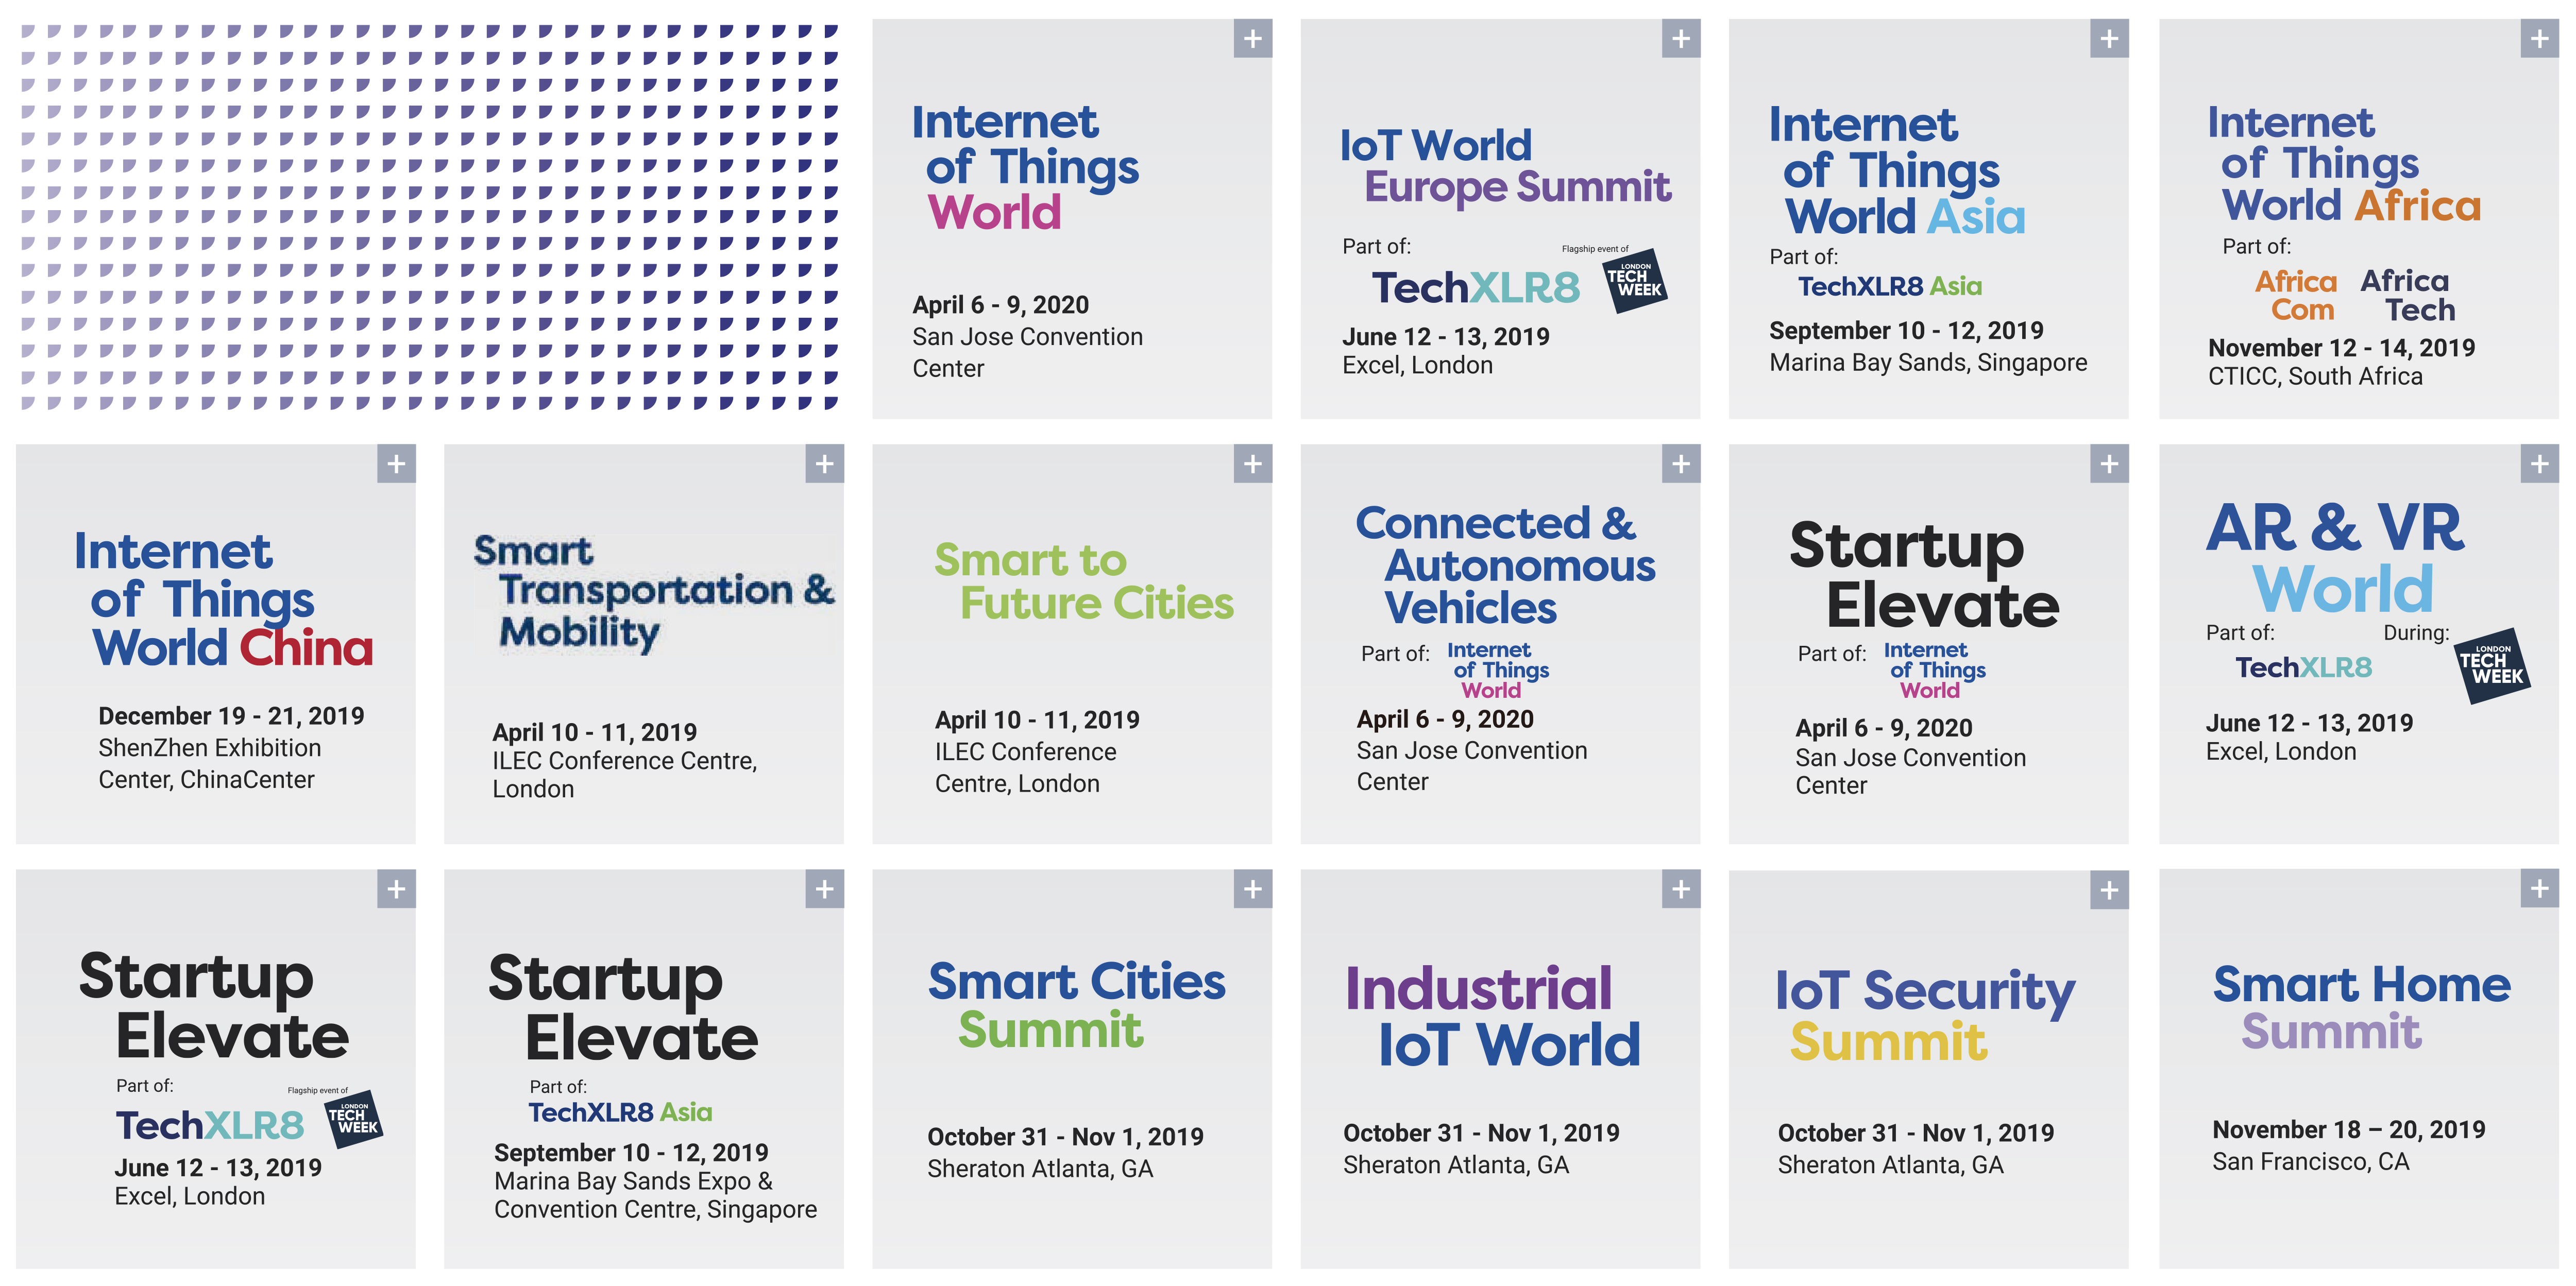 IoT World Series Calendar of Events